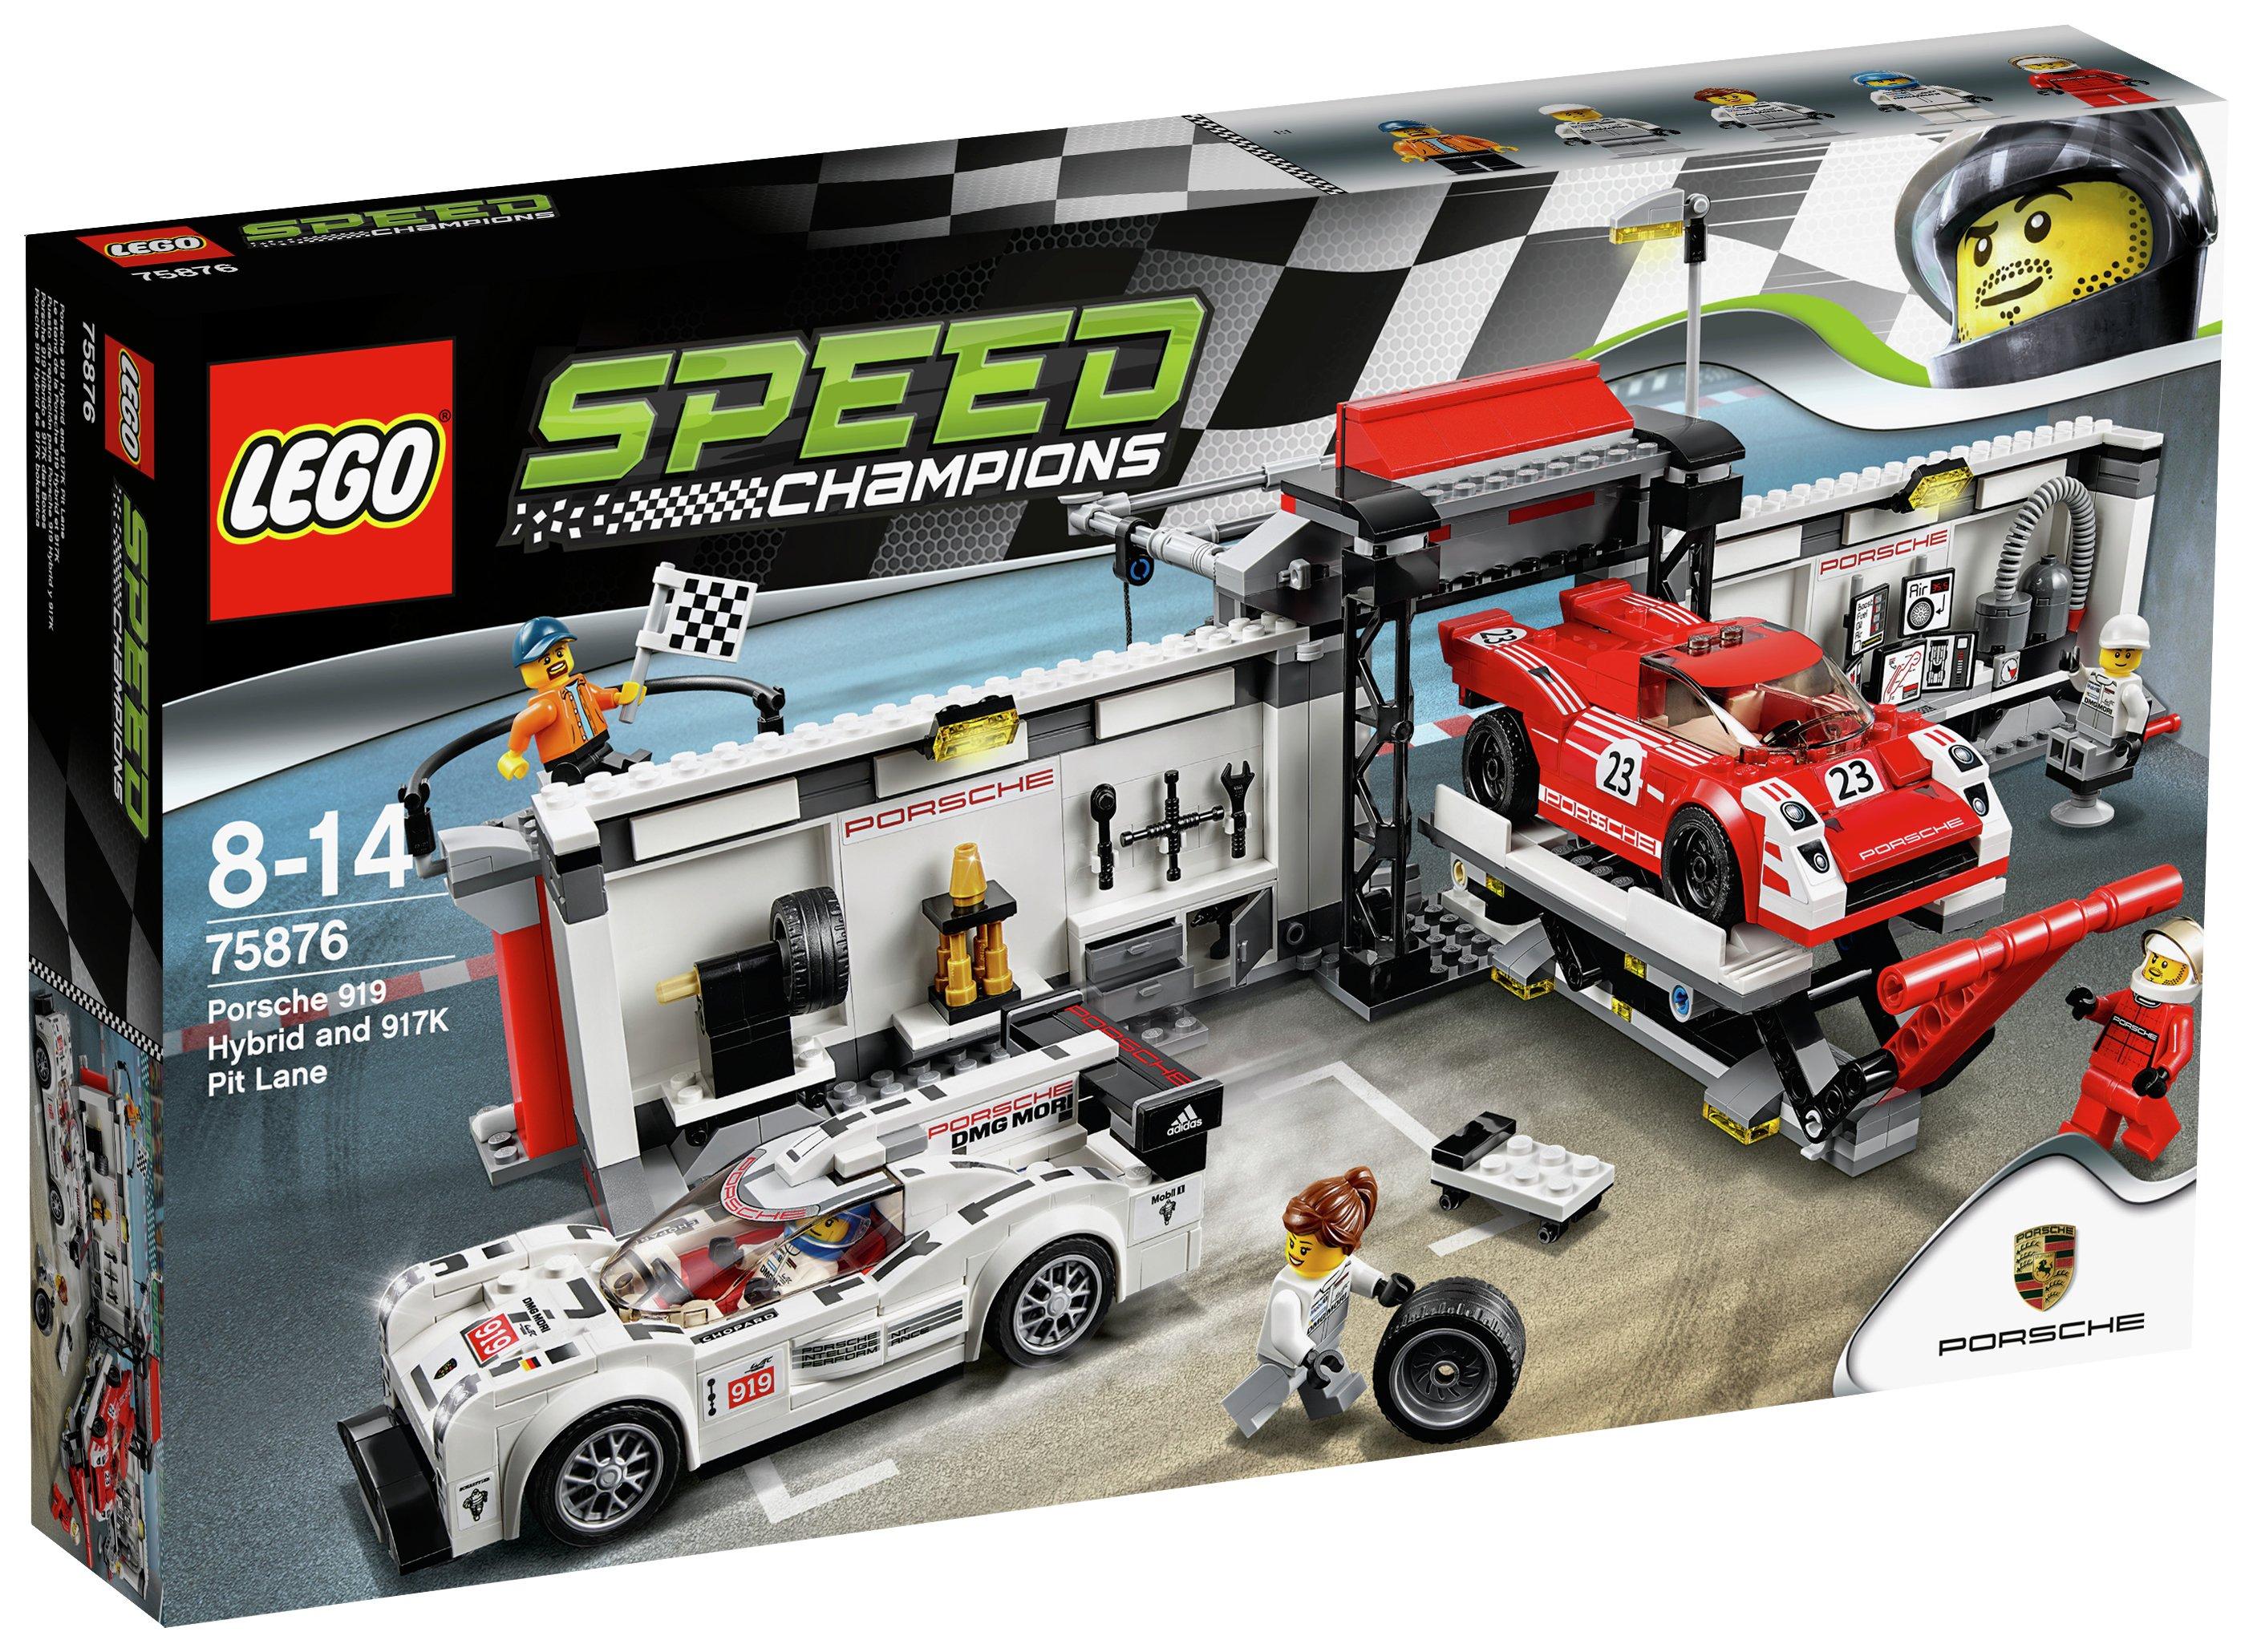 Image of LEGO Speedchamps Porsche 919 Hybrid & PI - 75876.